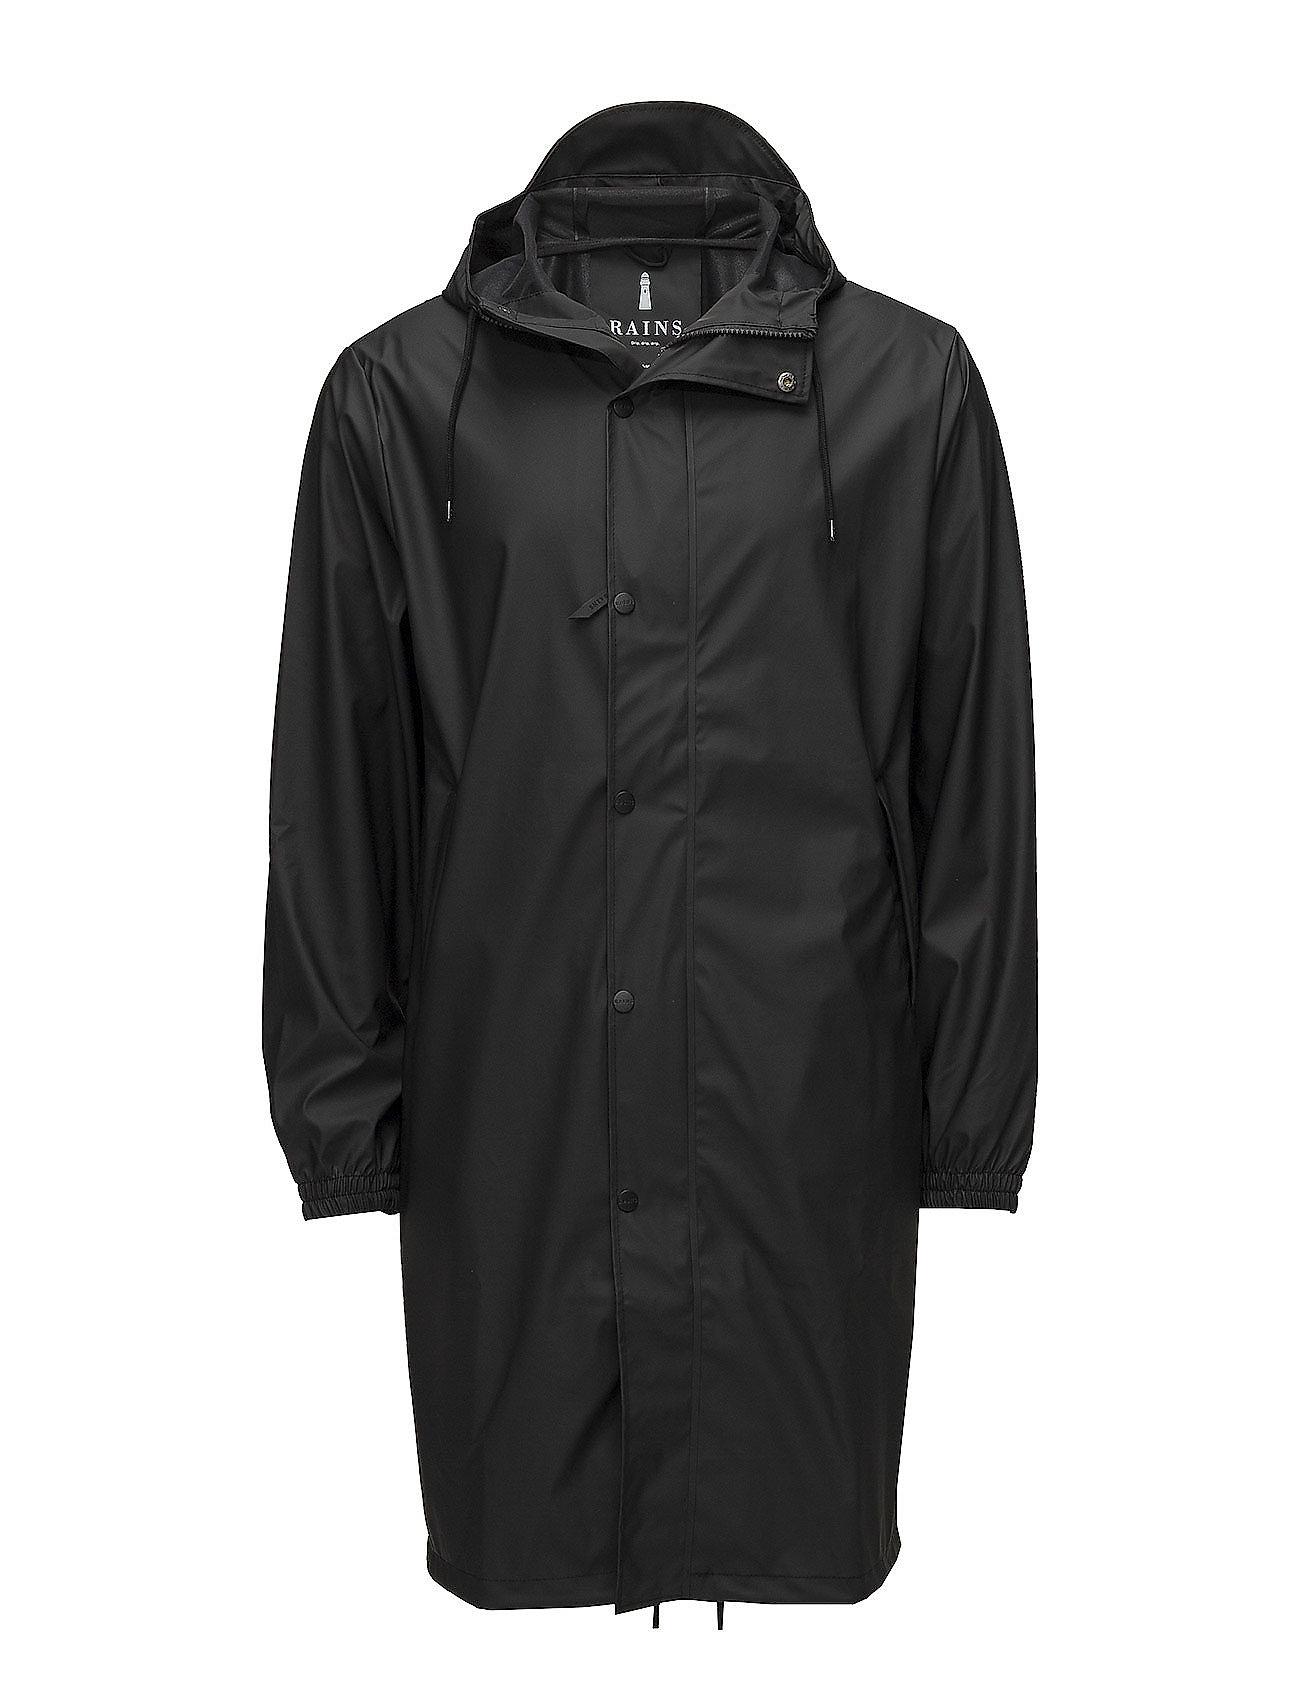 Rains Fishtail Parka - 01 BLACK